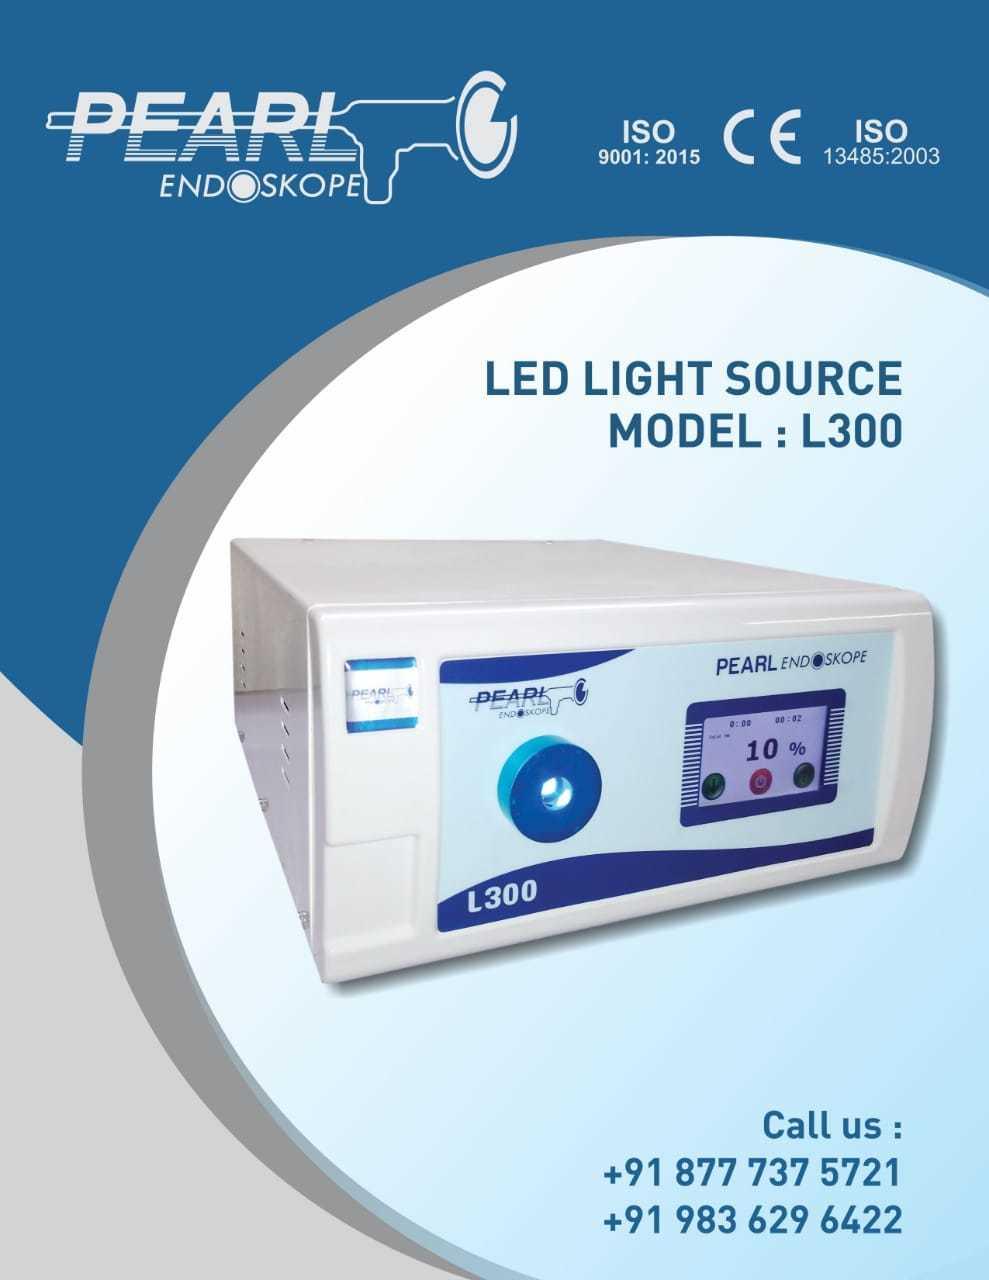 Pearl Endoskope Light Source